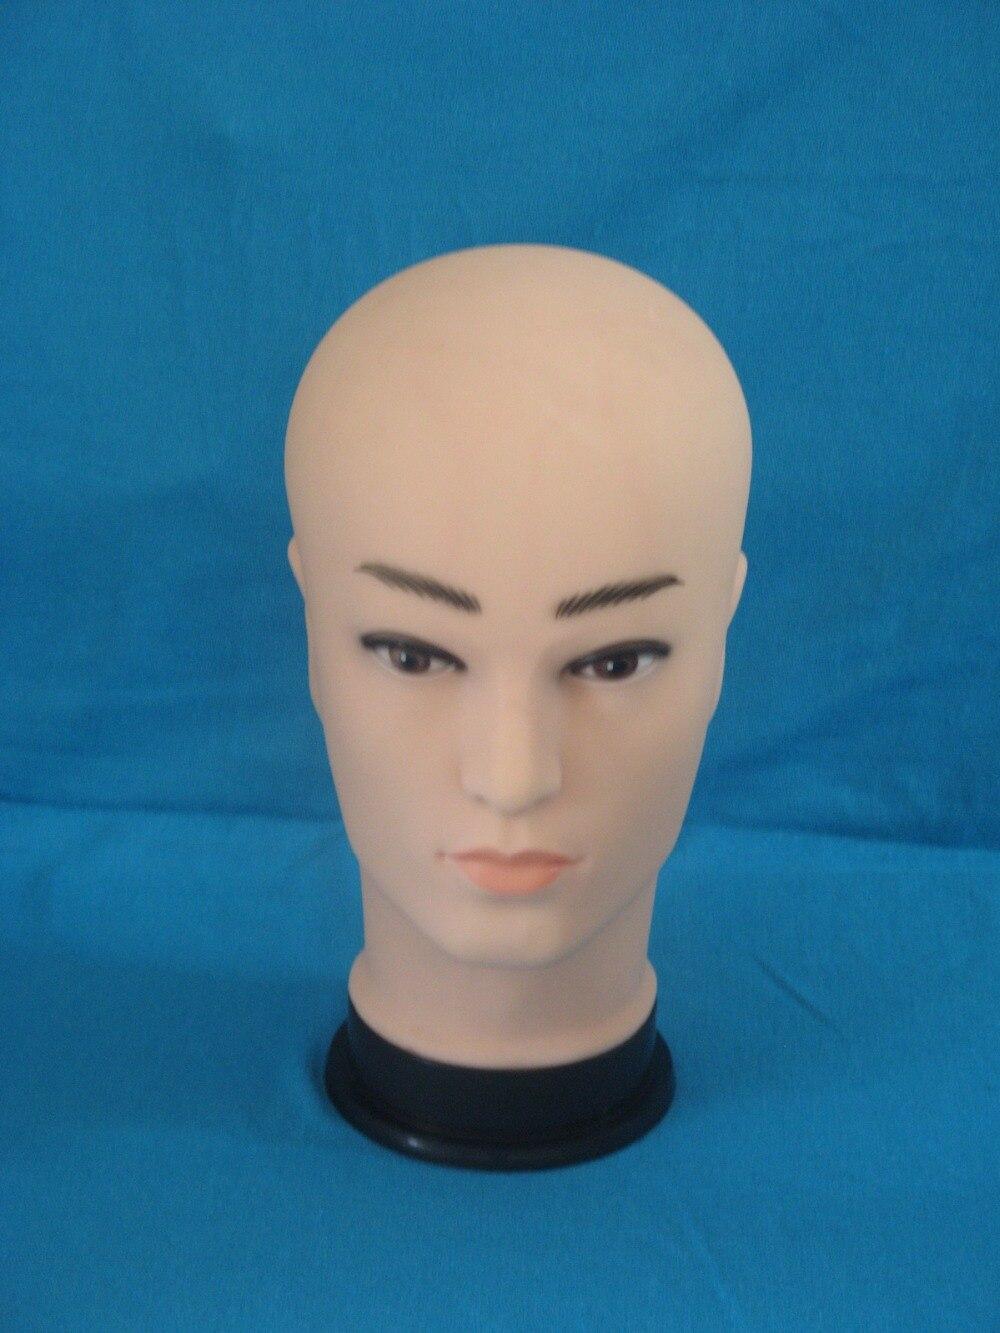 Realistic Plastic Male Mannequin Dummy Head, Manikin Heads For Hat